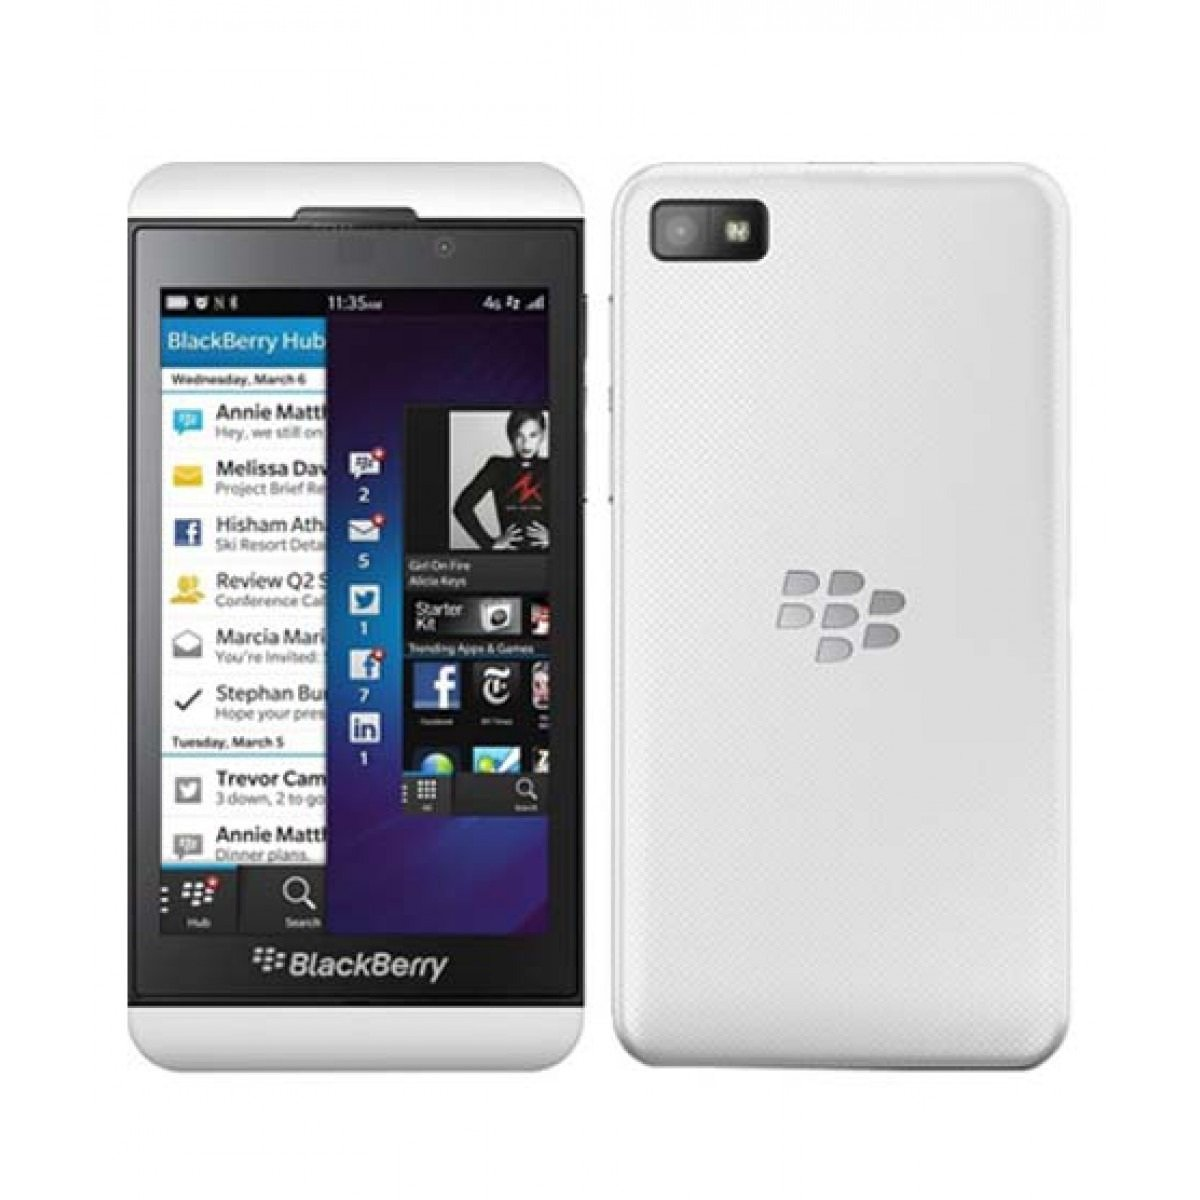 amazon com blackberry z10 16gb os 10 gsm unlocked smartphone